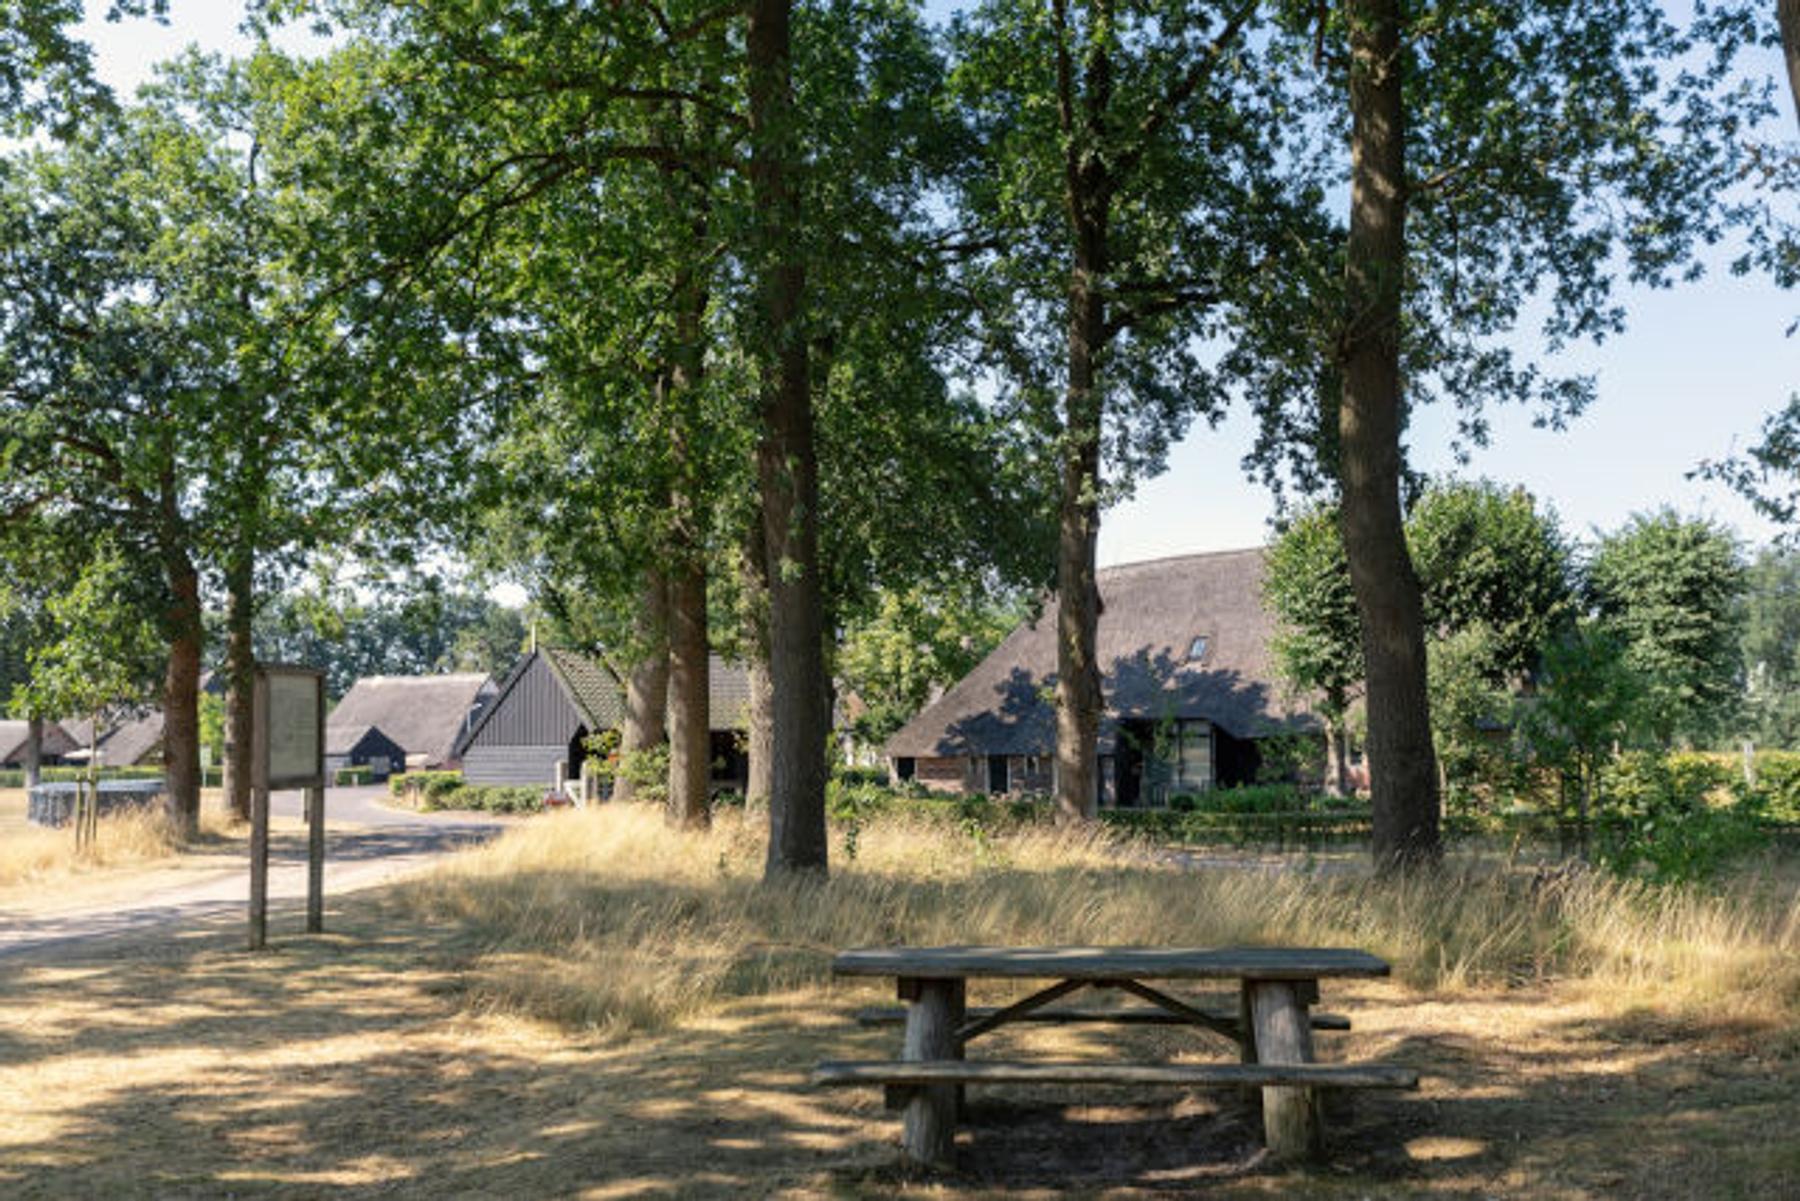 Brinkdorpen Drenthe